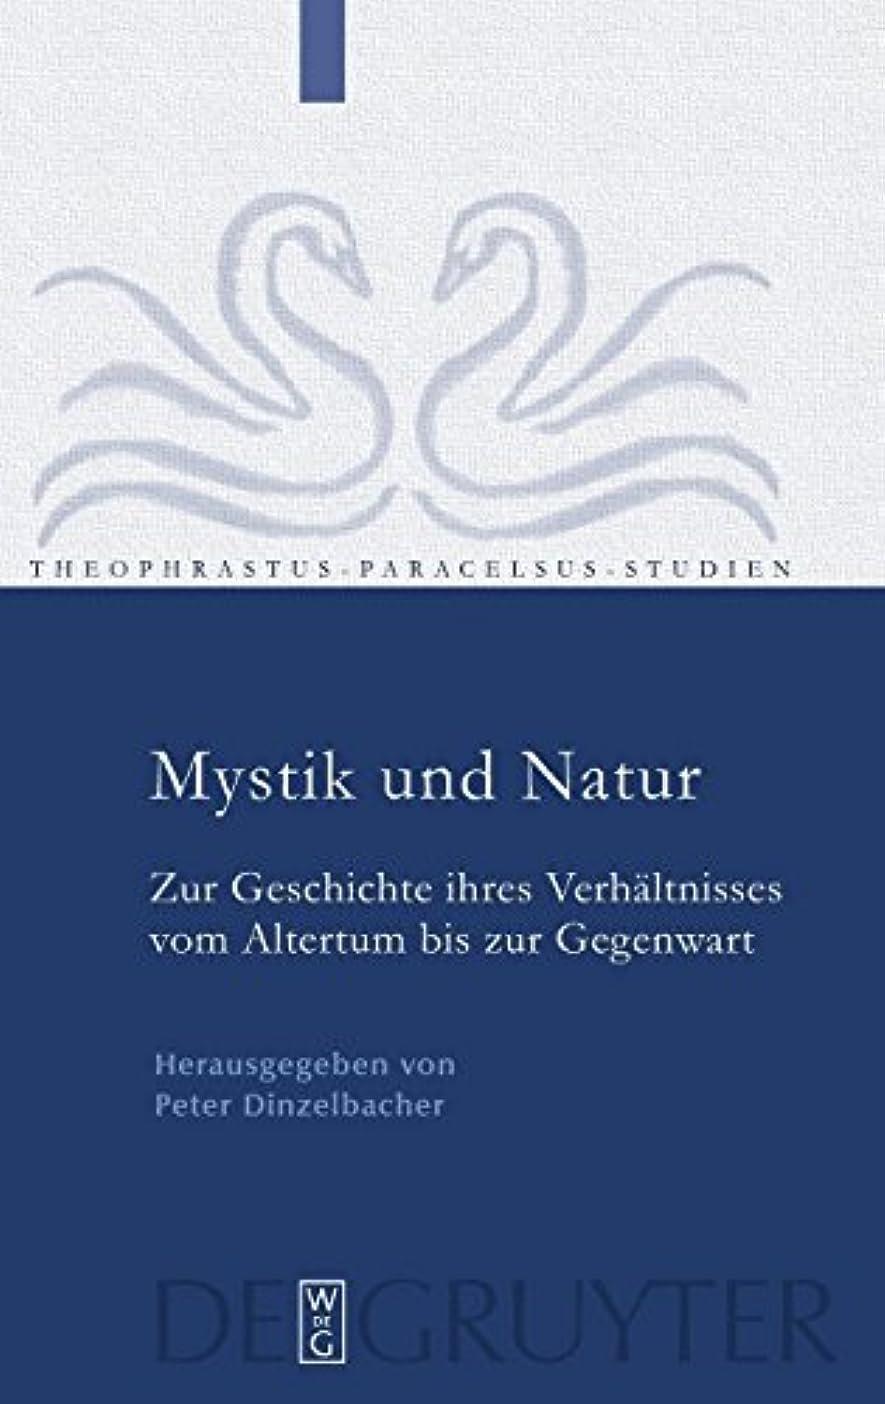 合成記事魅惑的なMystik und Natur: Zur Geschichte ihres Verhaeltnisses vom Altertum bis zur Gegenwart (Theophrastus Paracelsus Studien)